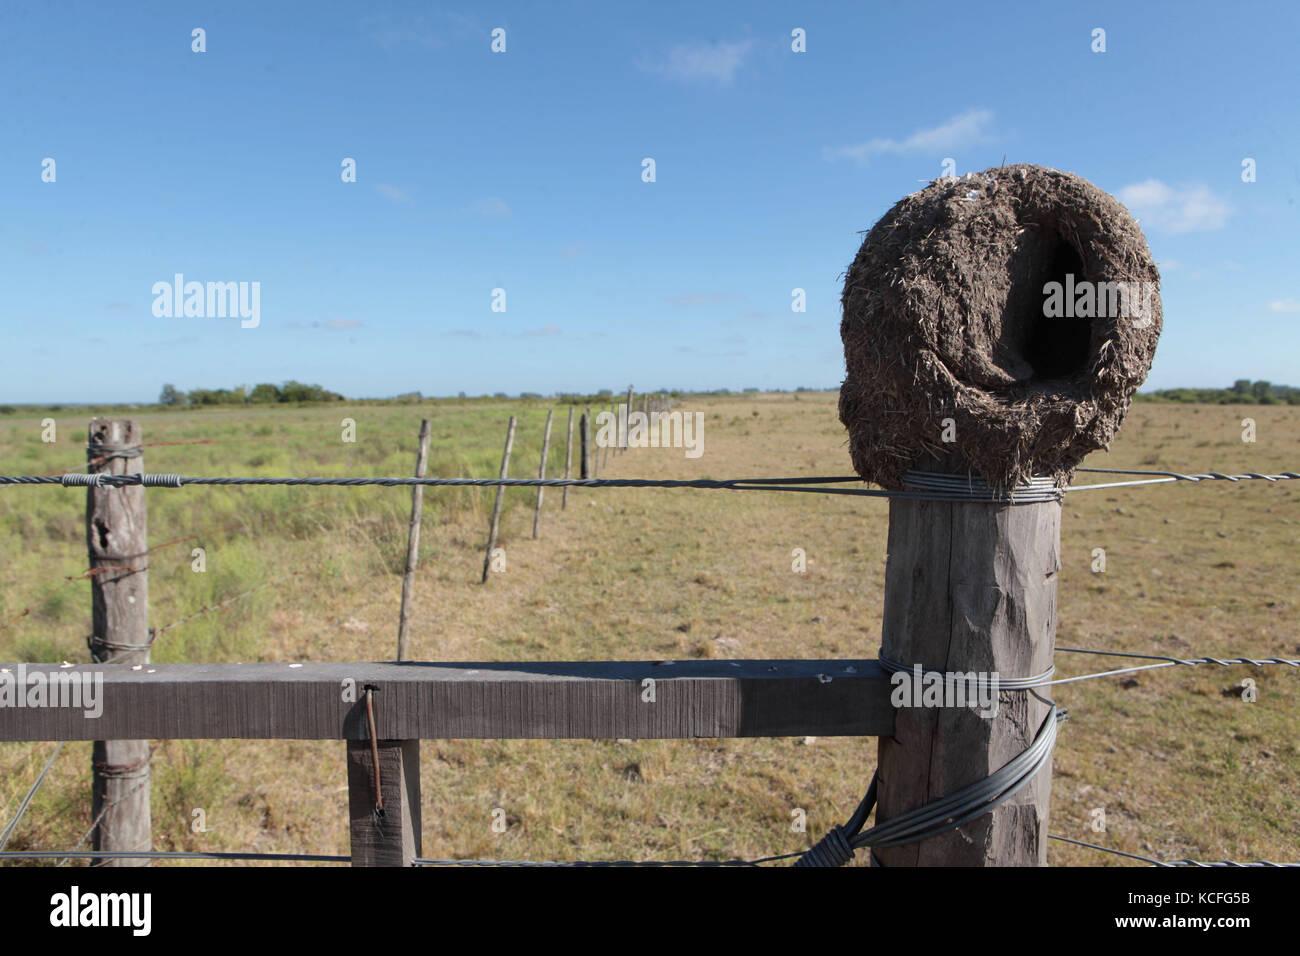 Nest of birds, trunk, fence, 2011, Uruguay - Stock Image